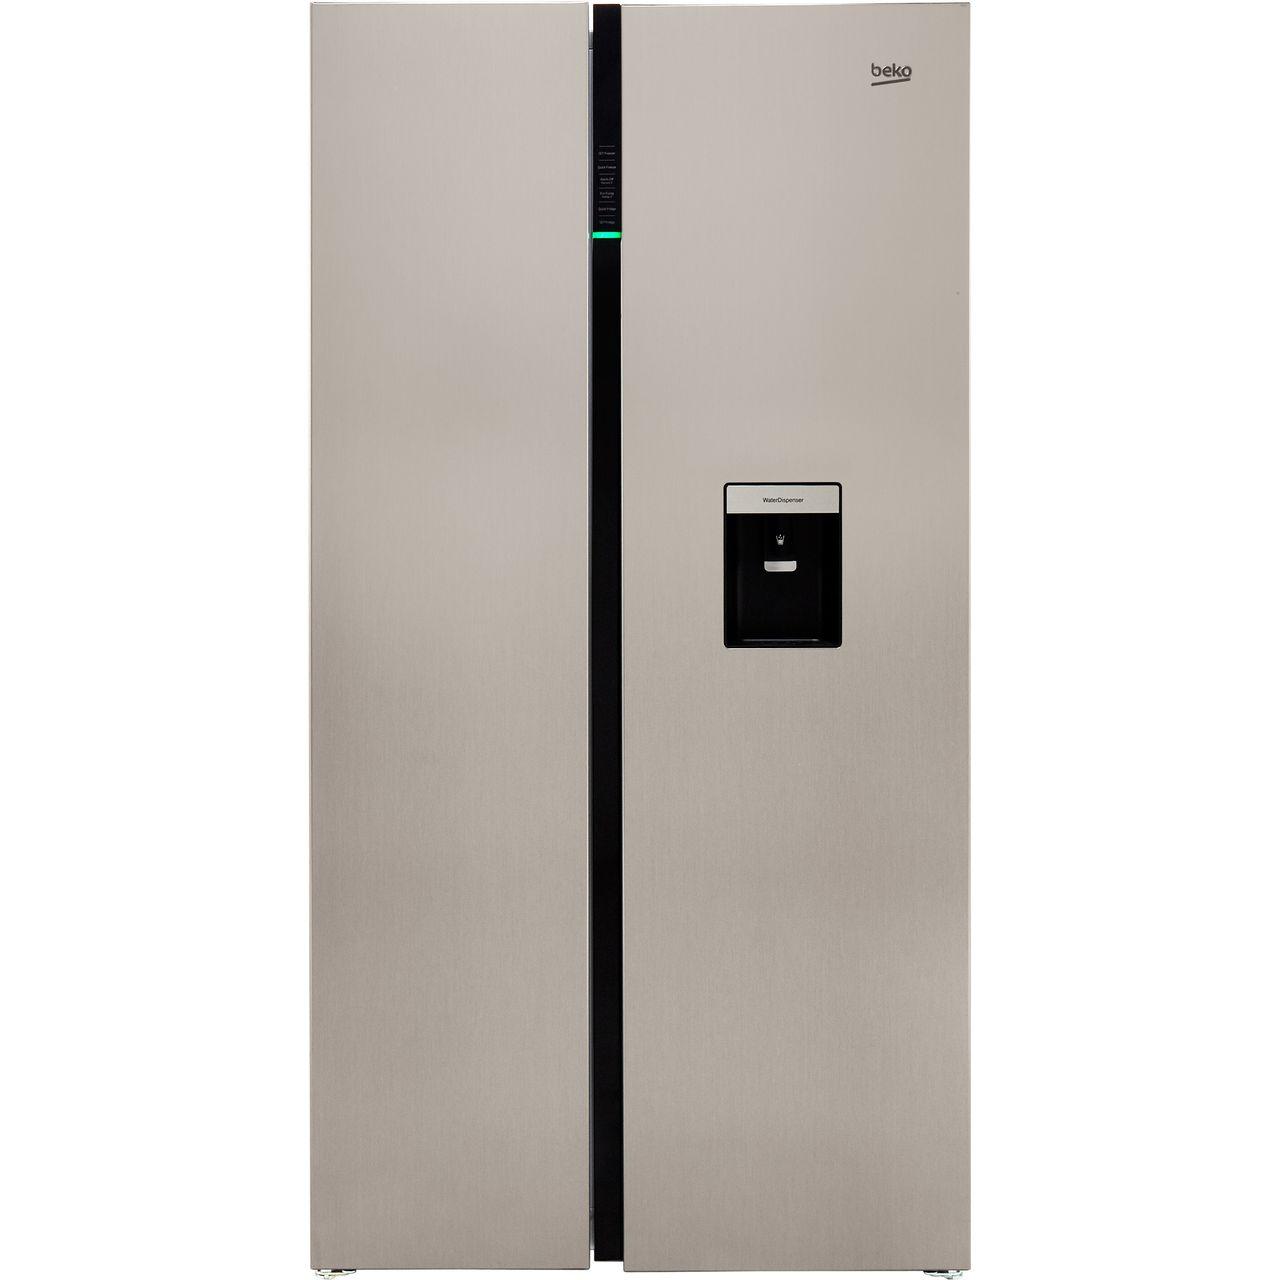 Beko RASGD242PX American Fridge Freezer - Brushed Steel - A+ Rated